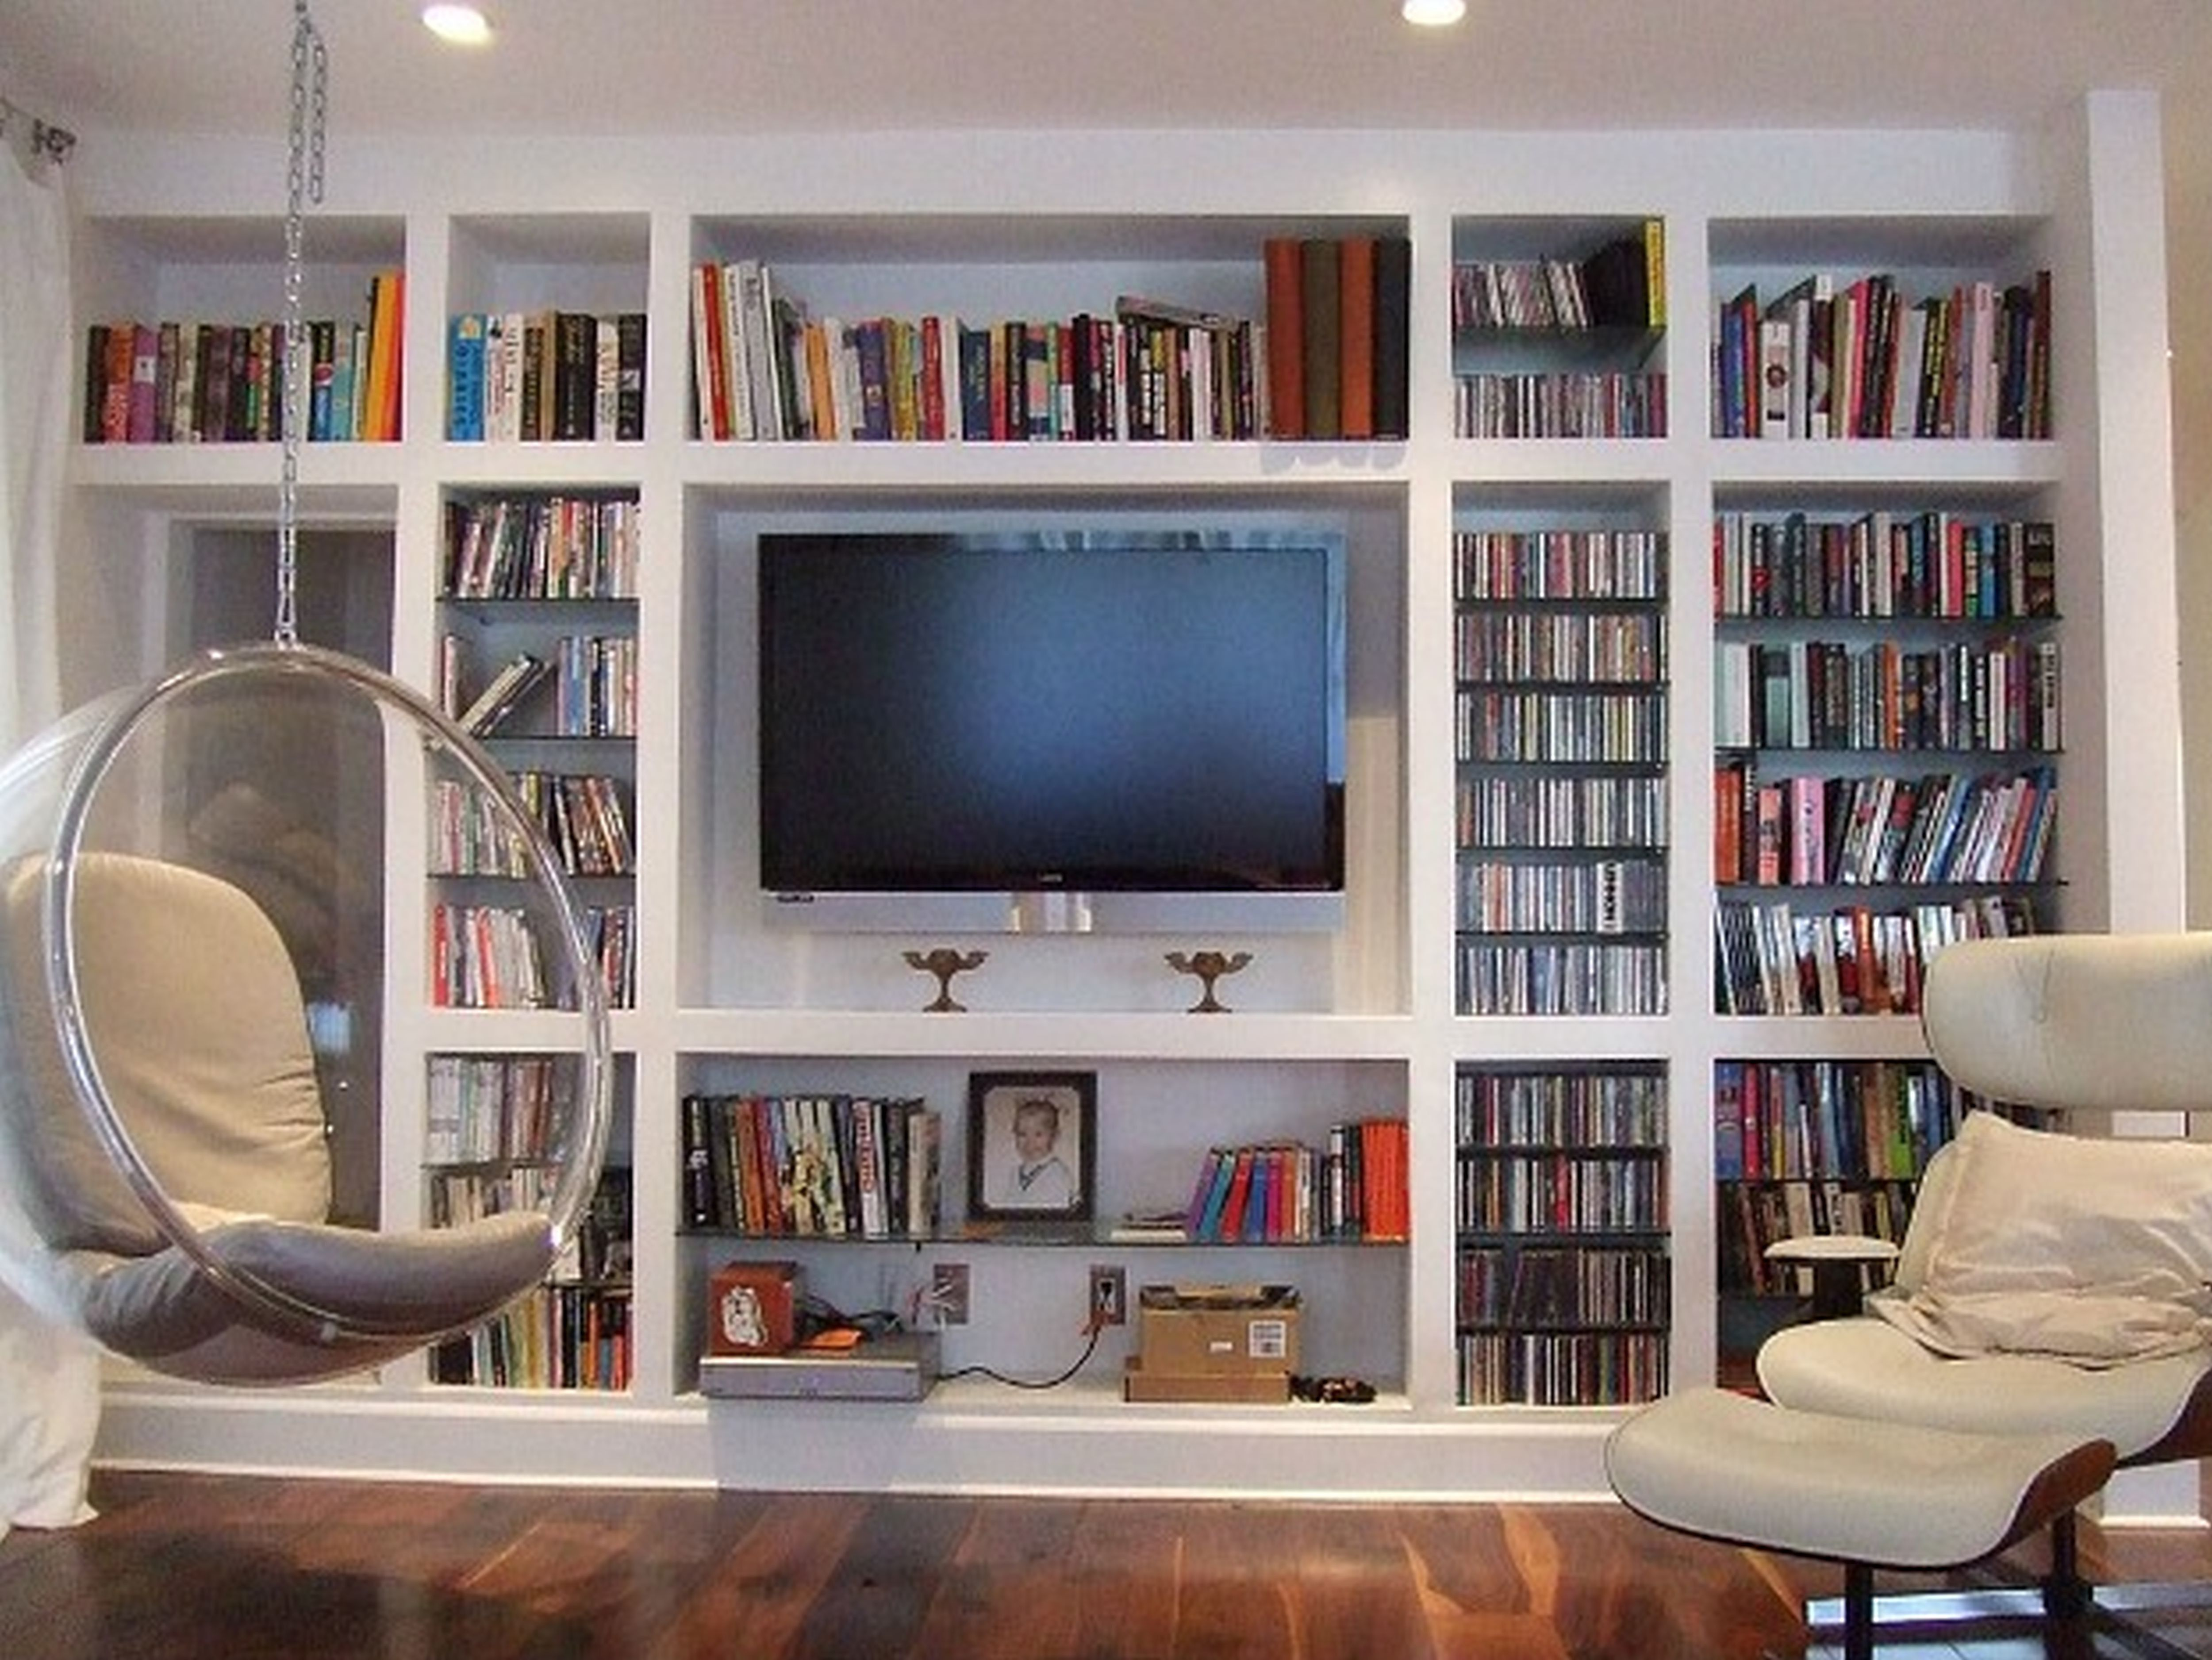 shelving ideas plans wall bookcase free bedrooms bookcases unit com white adorable design livingroom units bookshelf tv for